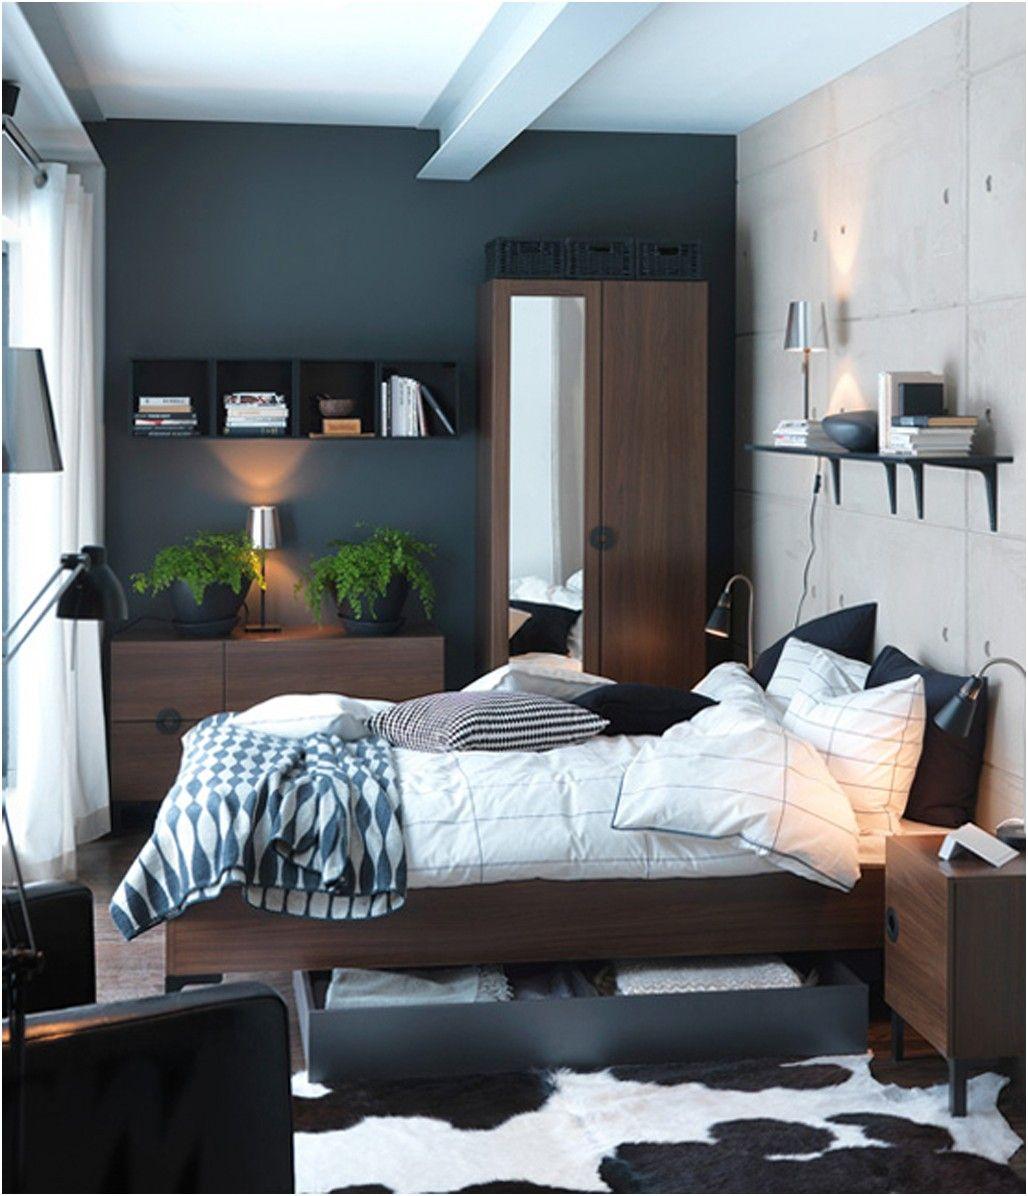 Ikea Bedroom Ideas Hemnes Google Search Small Master Bedroom